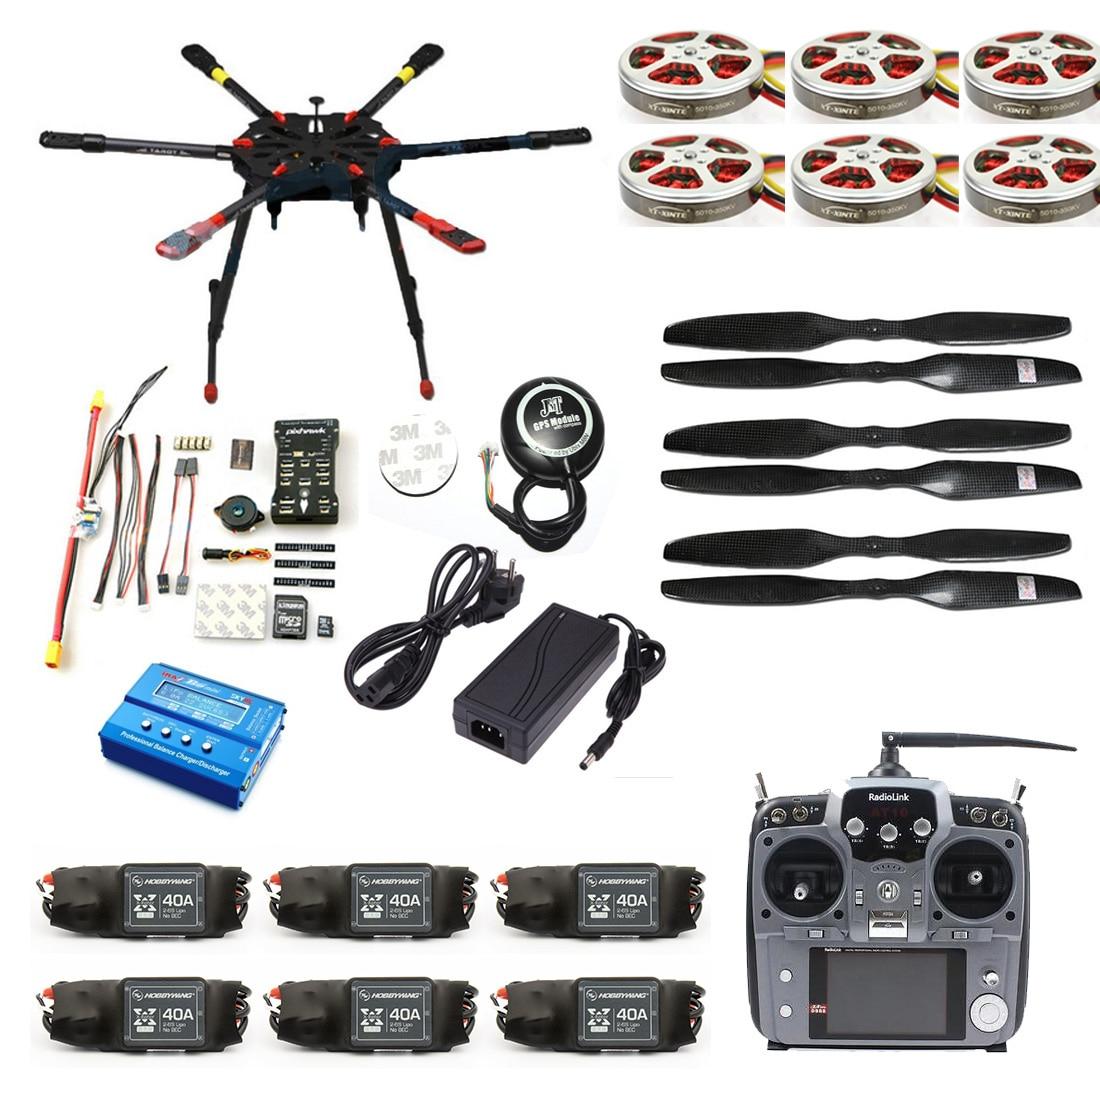 JMT Pro 2.4G 10CH 960mm Tarocchi X6 Pieghevole A Scomparsa PIX PX4 M8N GPS ARF/PNF Kit FAI DA TE RC Hexacopter Drone Unassembly F11283-A/B